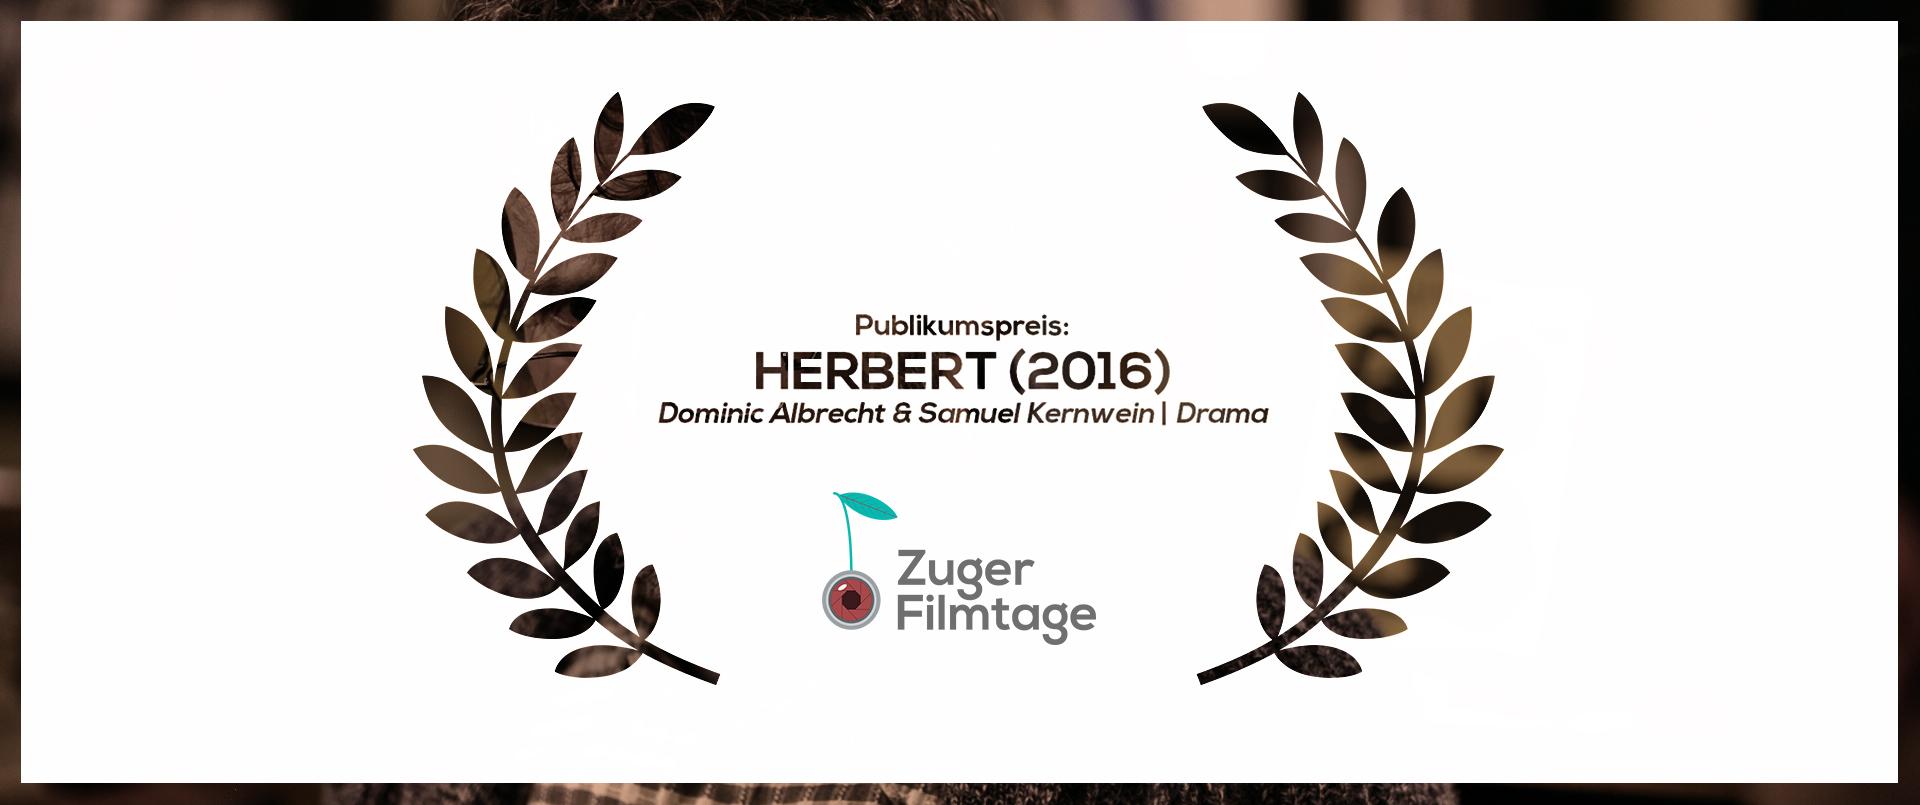 herbert_publikumspreis_zugerfilmtage_010